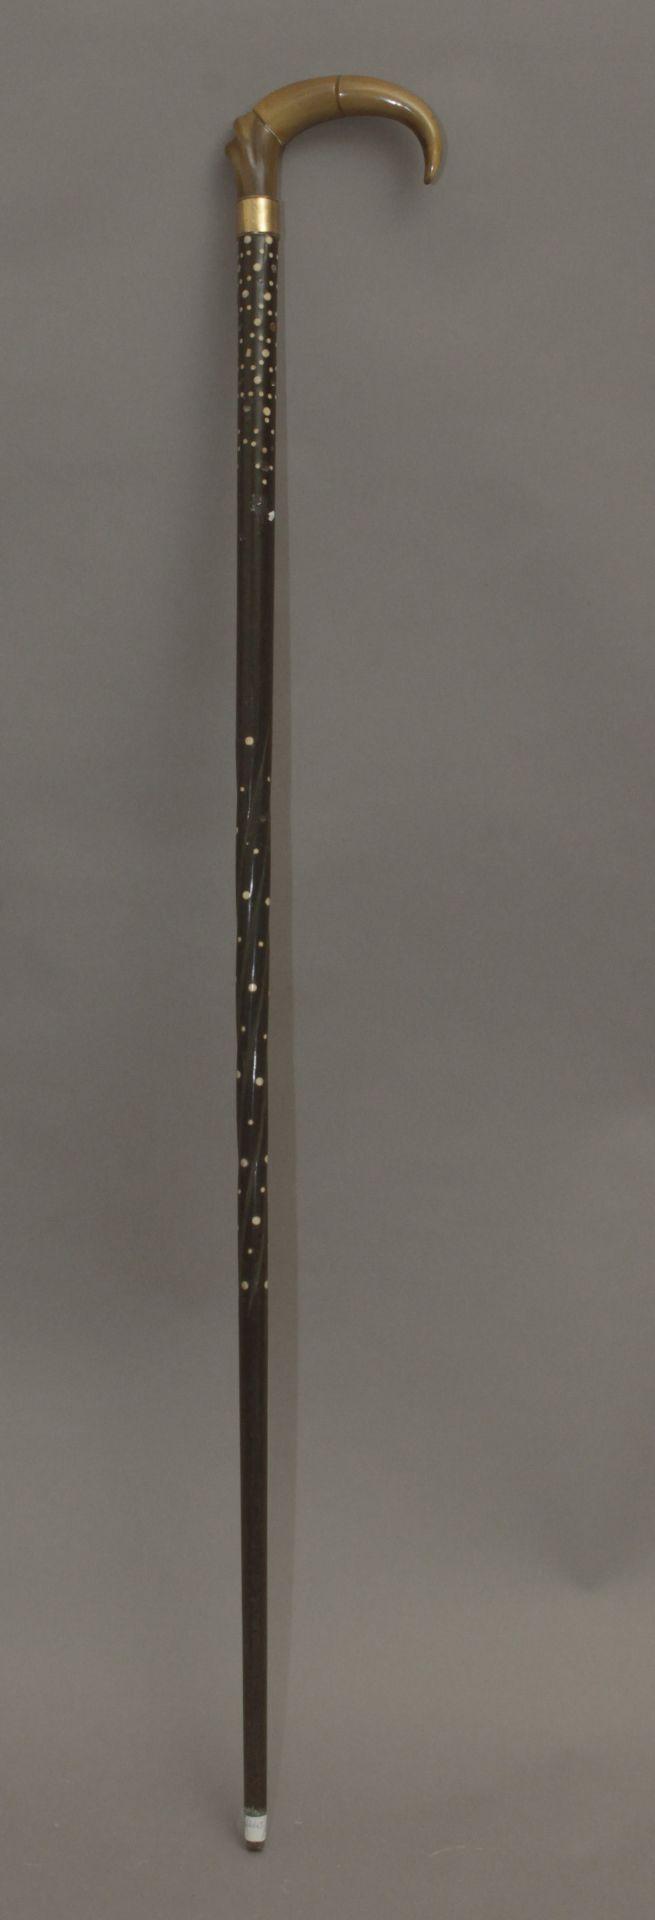 An Anglo-Indian walking stick circa 1900 - Bild 2 aus 5